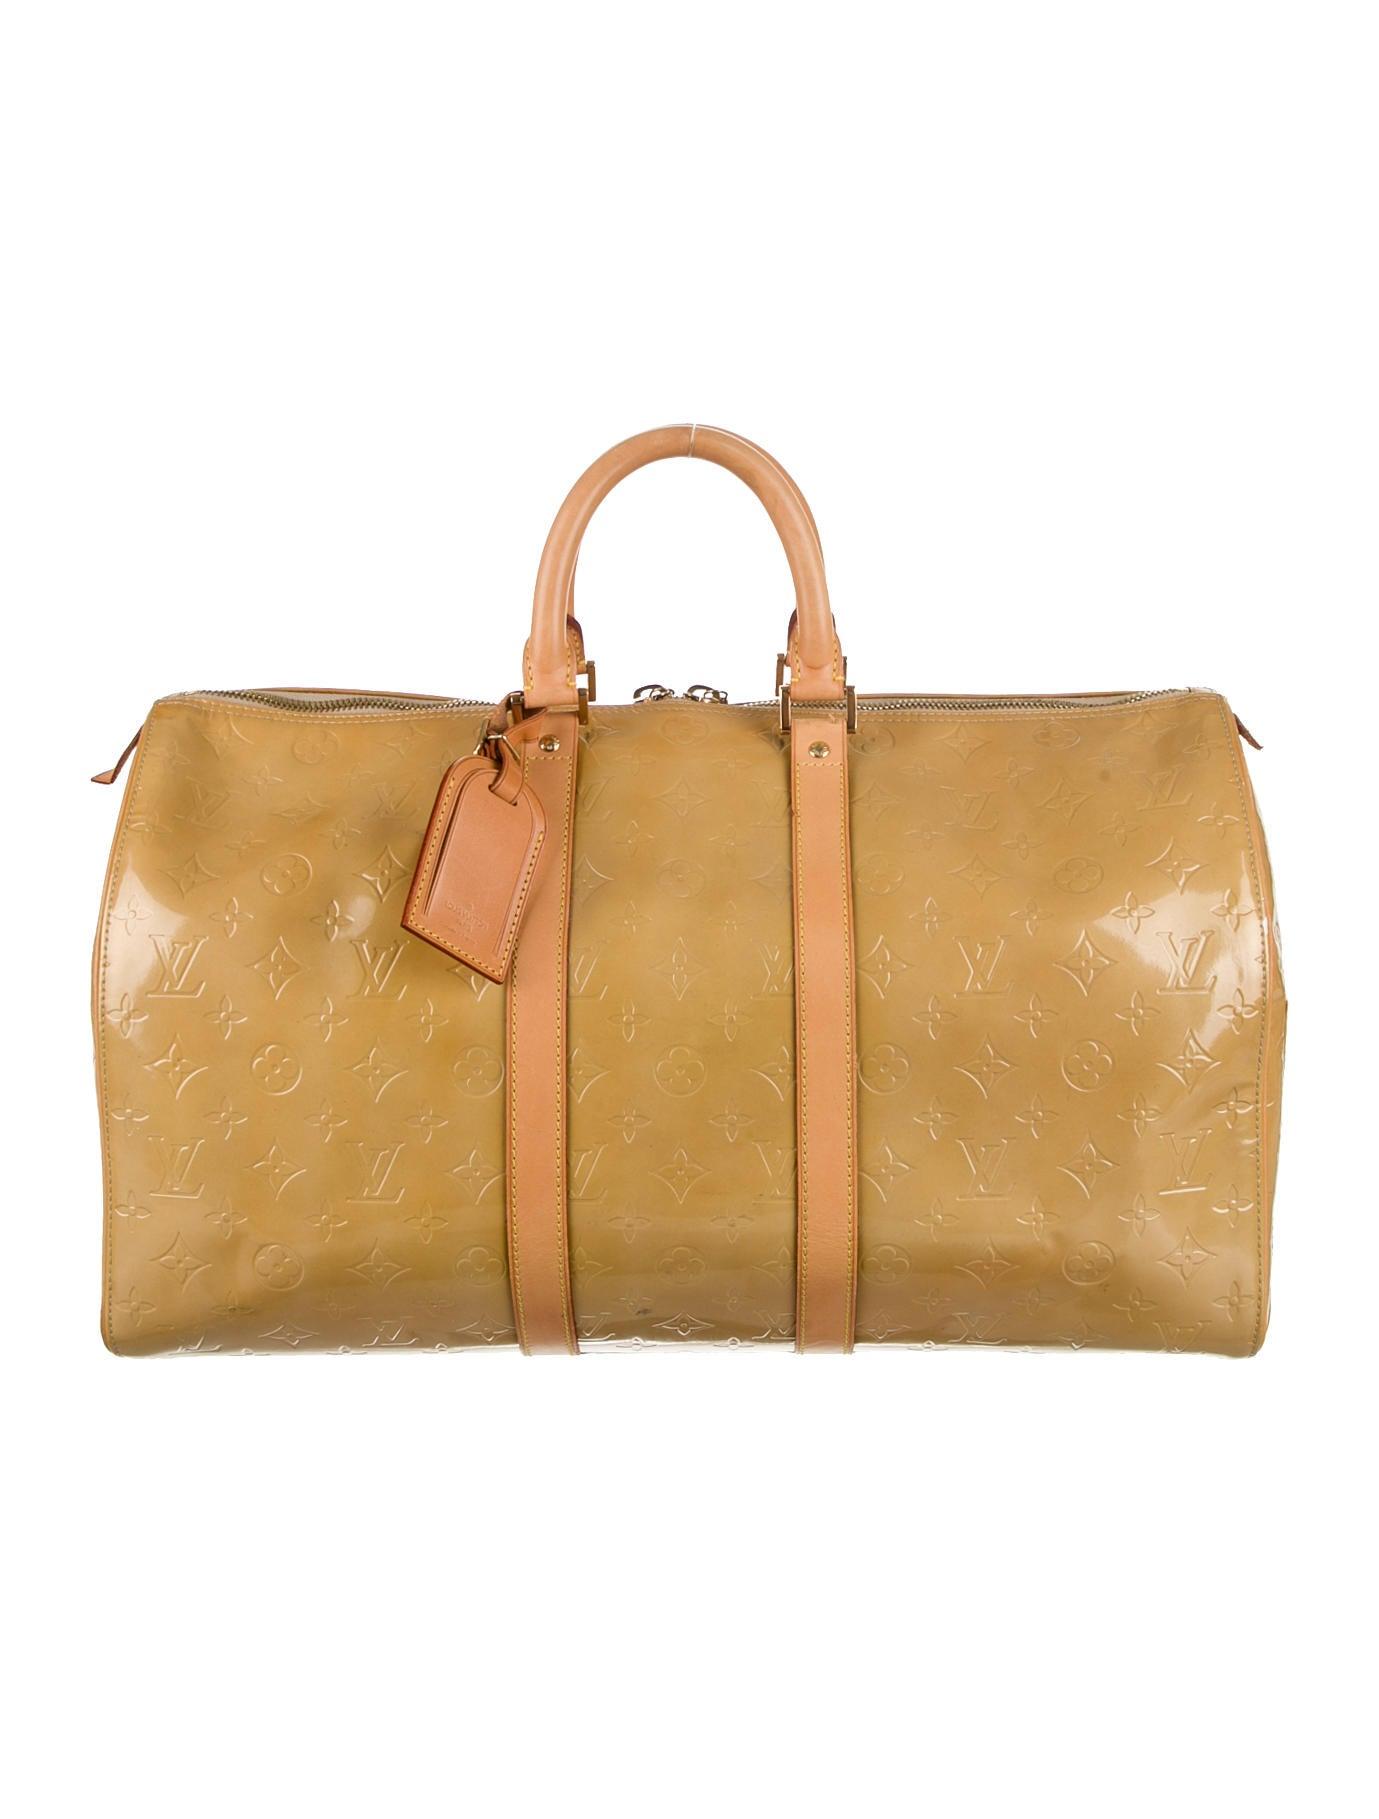 louis vuitton keepall 45 handbags lou47212 the realreal. Black Bedroom Furniture Sets. Home Design Ideas